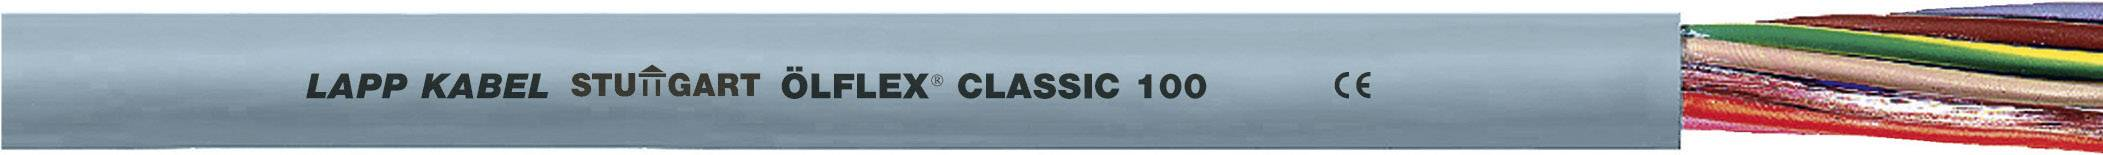 Kabel LappKabel Ölflex CLASSIC 100 4G1,5 (00100654), PVC, 7,2 mm, 500 V, šedá, 1000 m